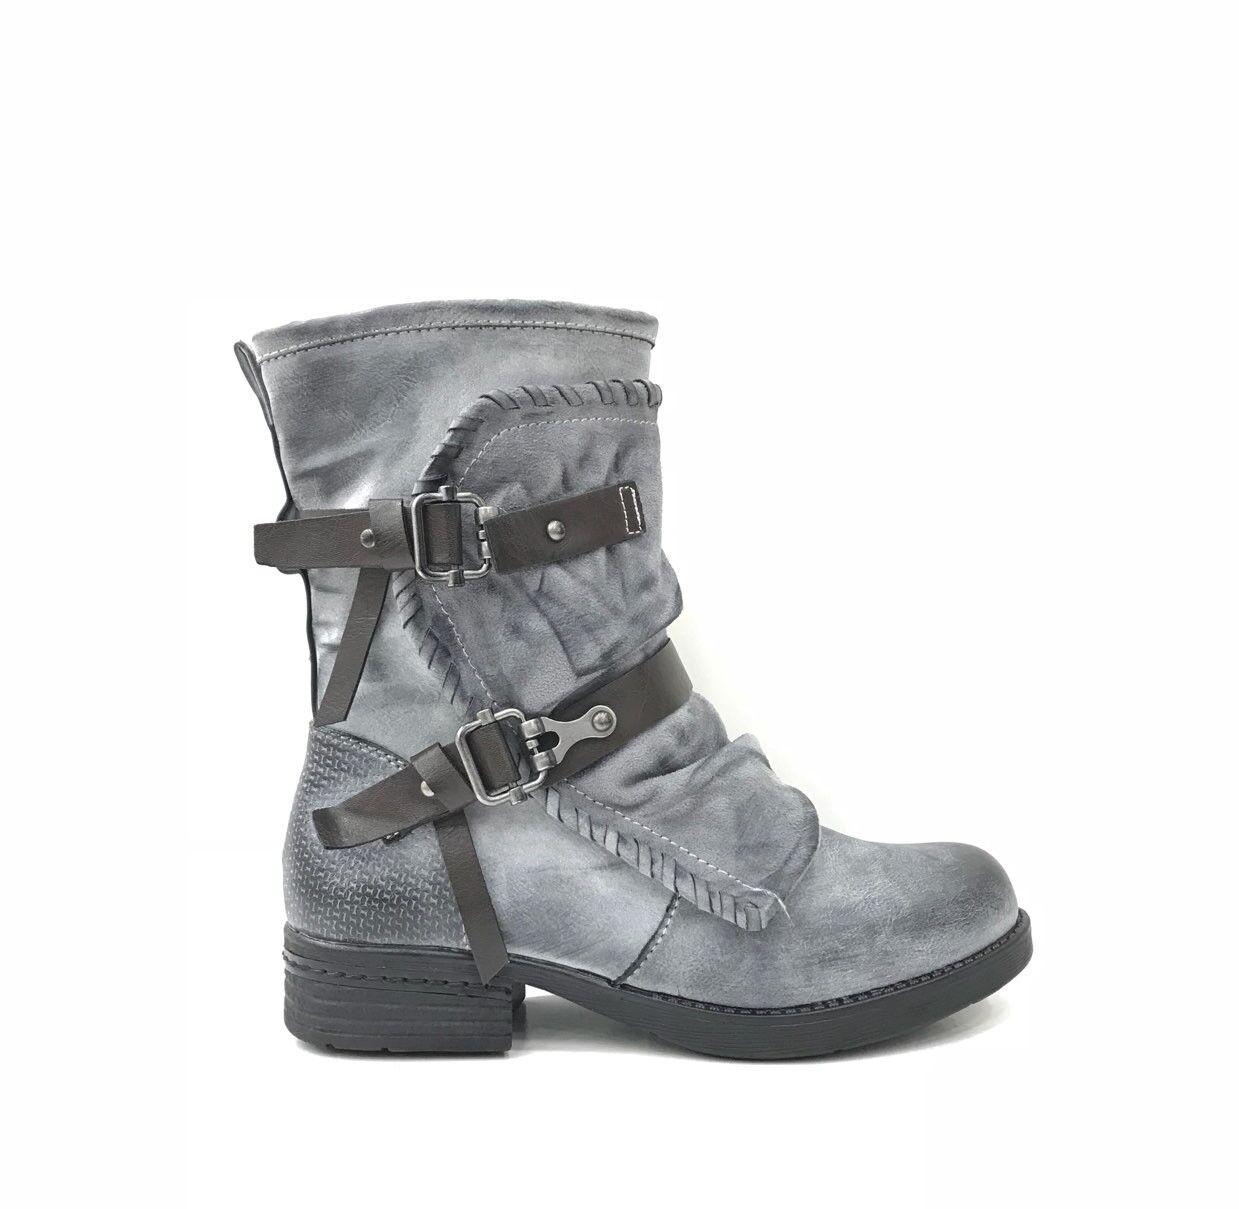 Damen Stiefeletten zapatos zapatos zapatos luxus Scnürer Nieten botas 3022 Schwarz 36 52be3d